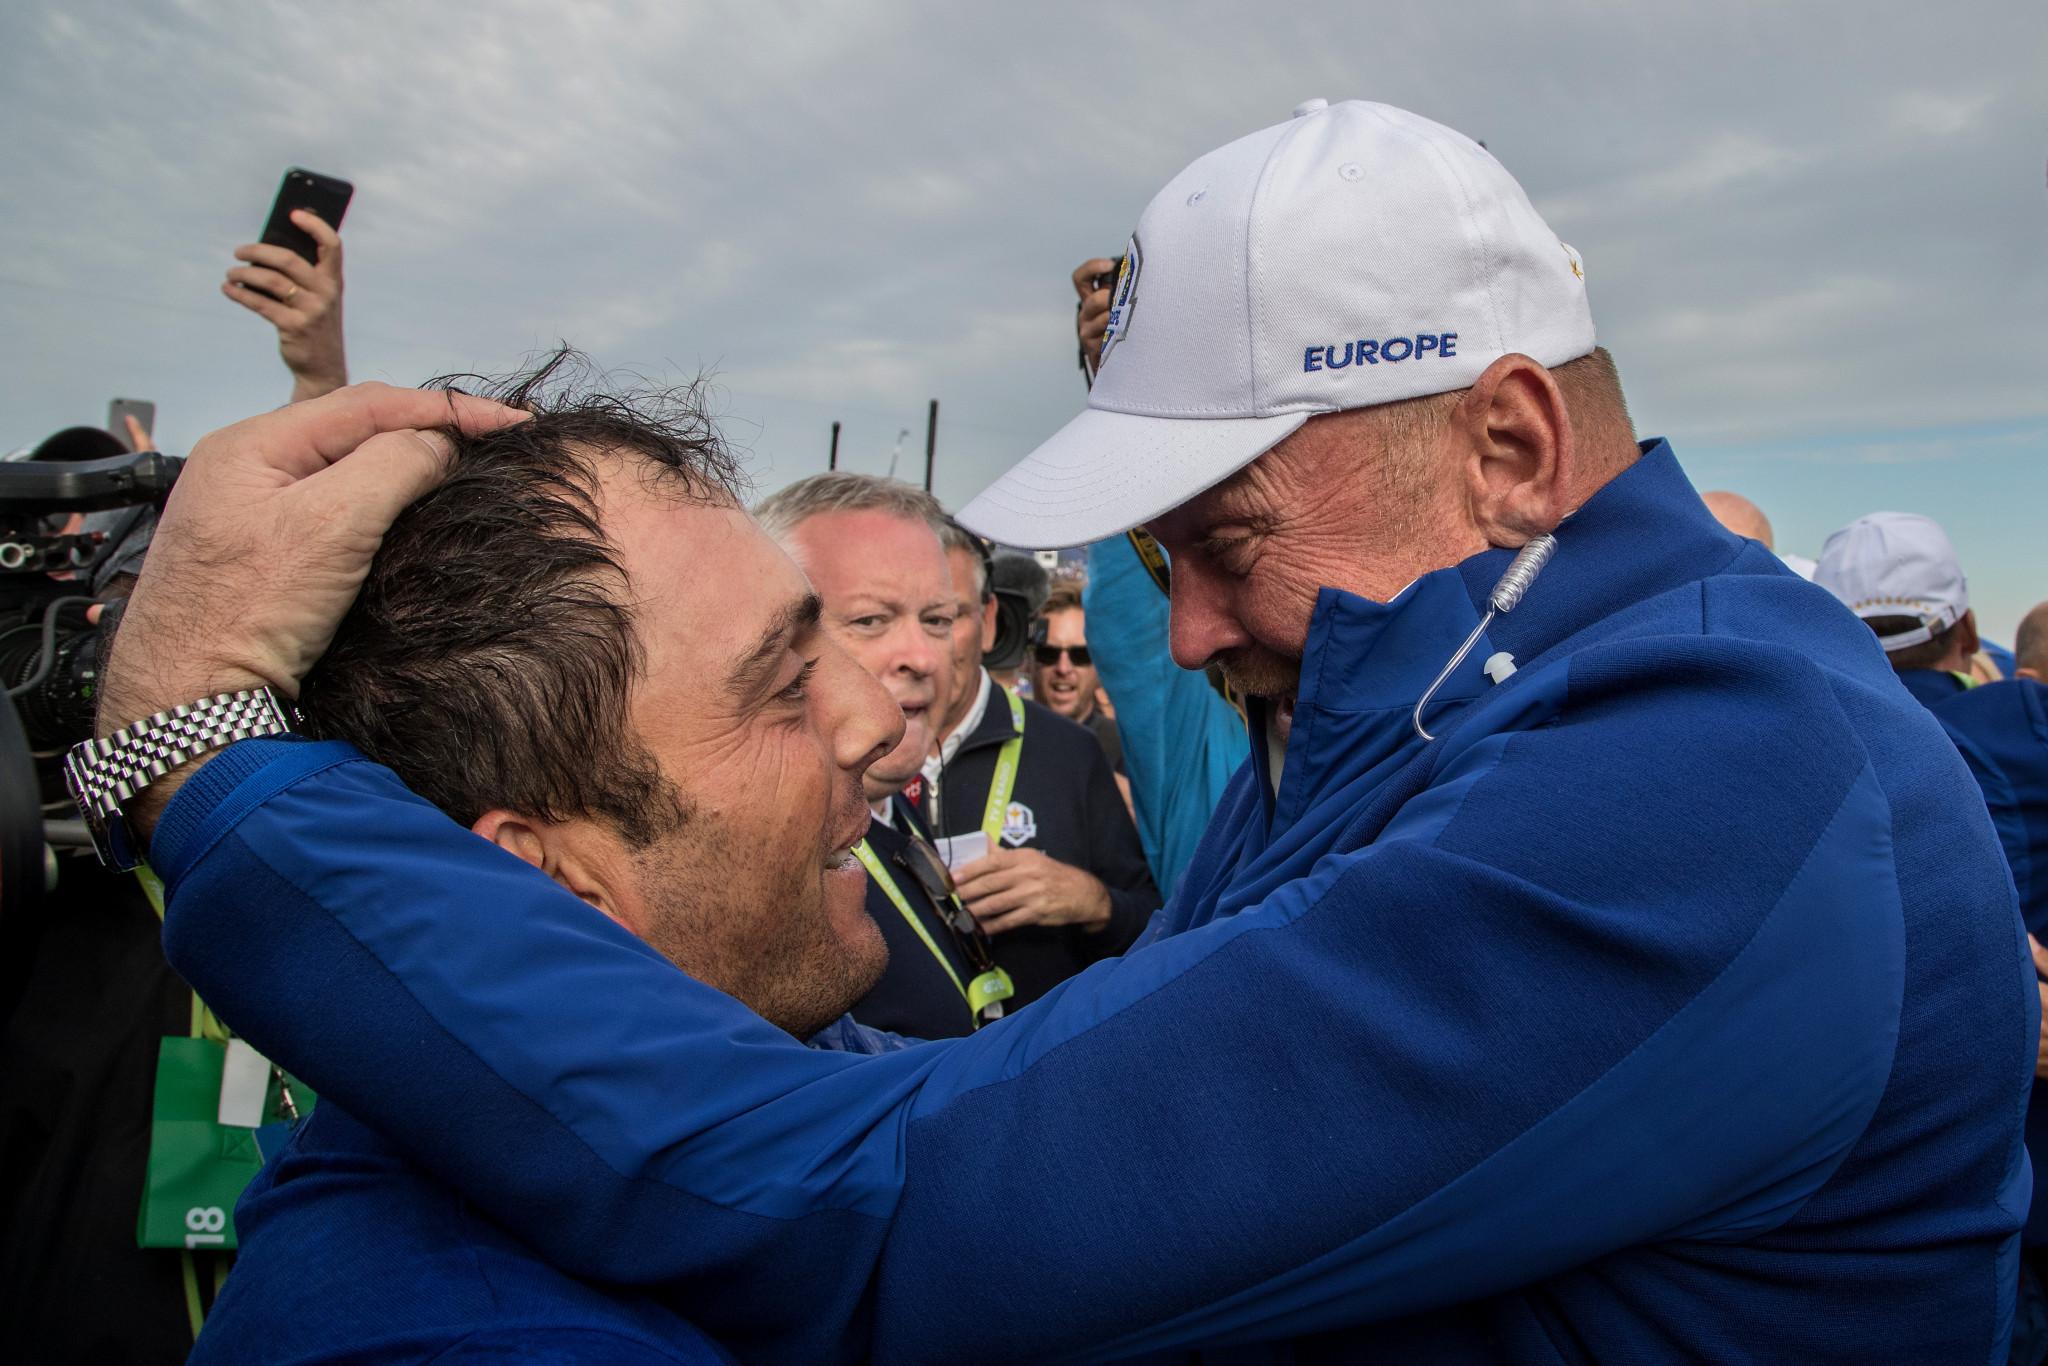 Adare Manor in Ireland to host 2026 Ryder Cup